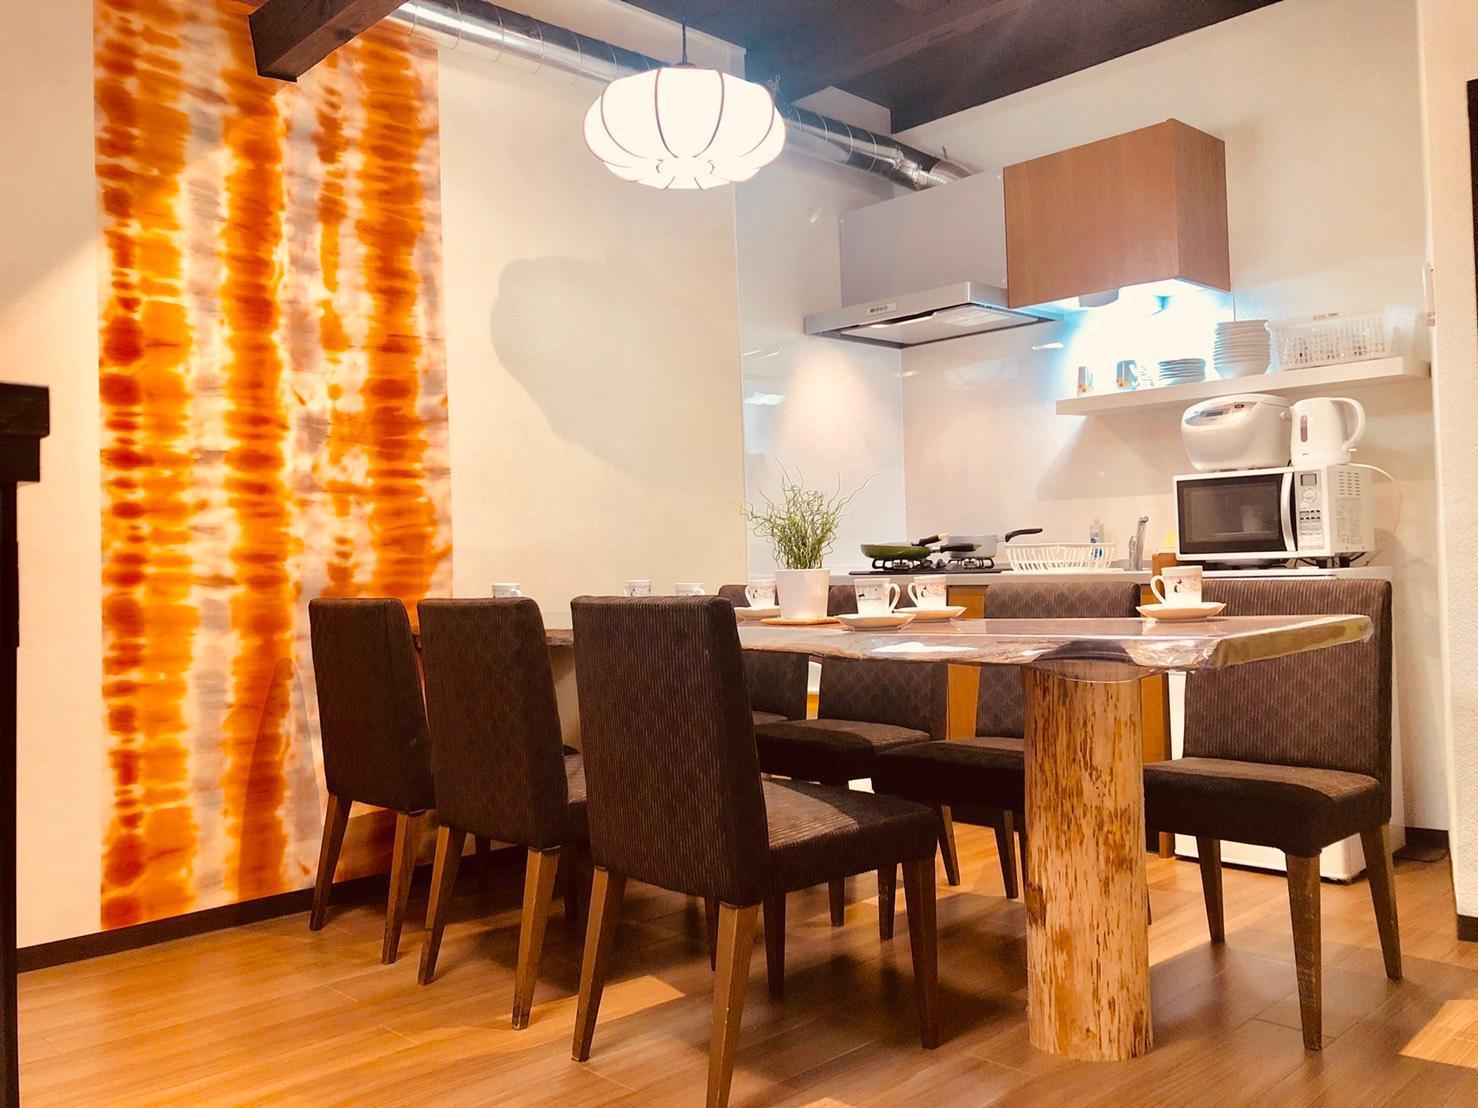 Lamp House 100M2 4Bedroom 2bath 2toilet Free WiFi